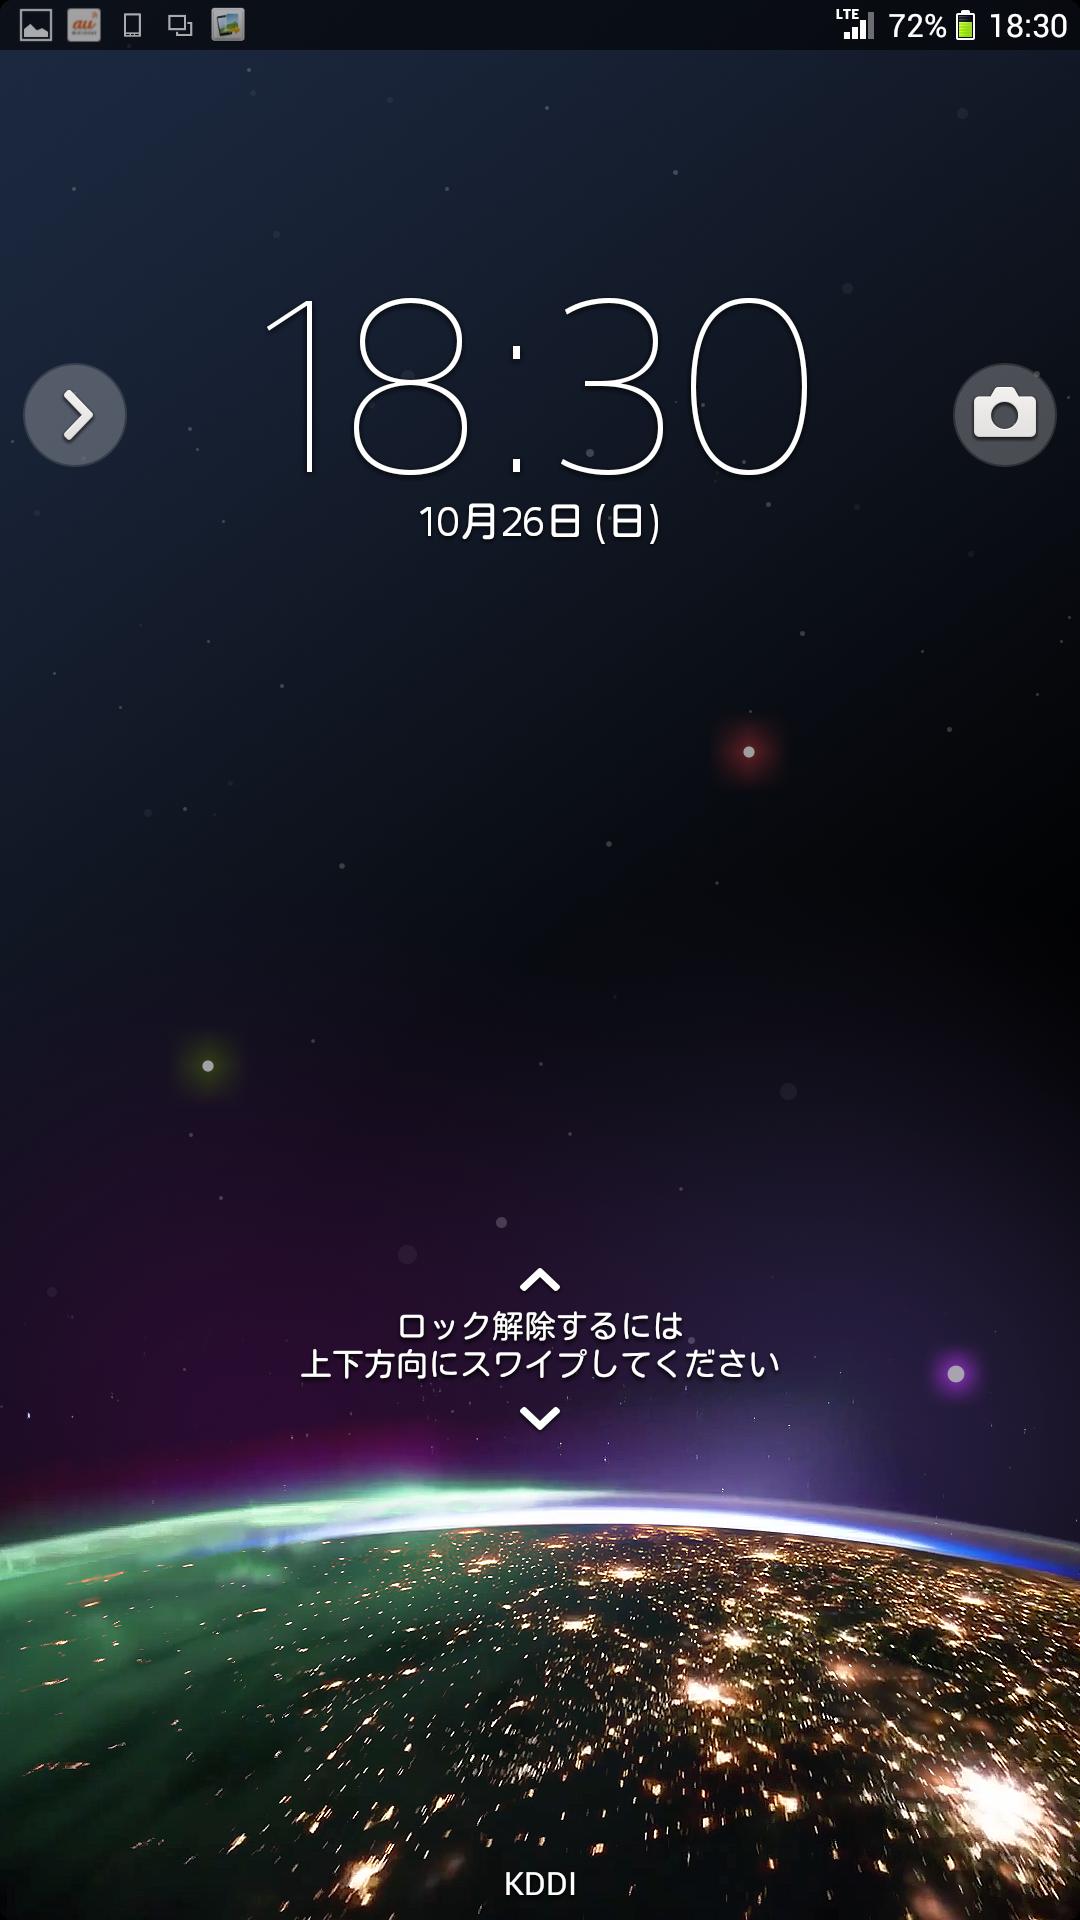 Sony Xperia Z Ultra Sol24 Android 4 2 2でのホーム画面や各種設定項目等 雑雪帳